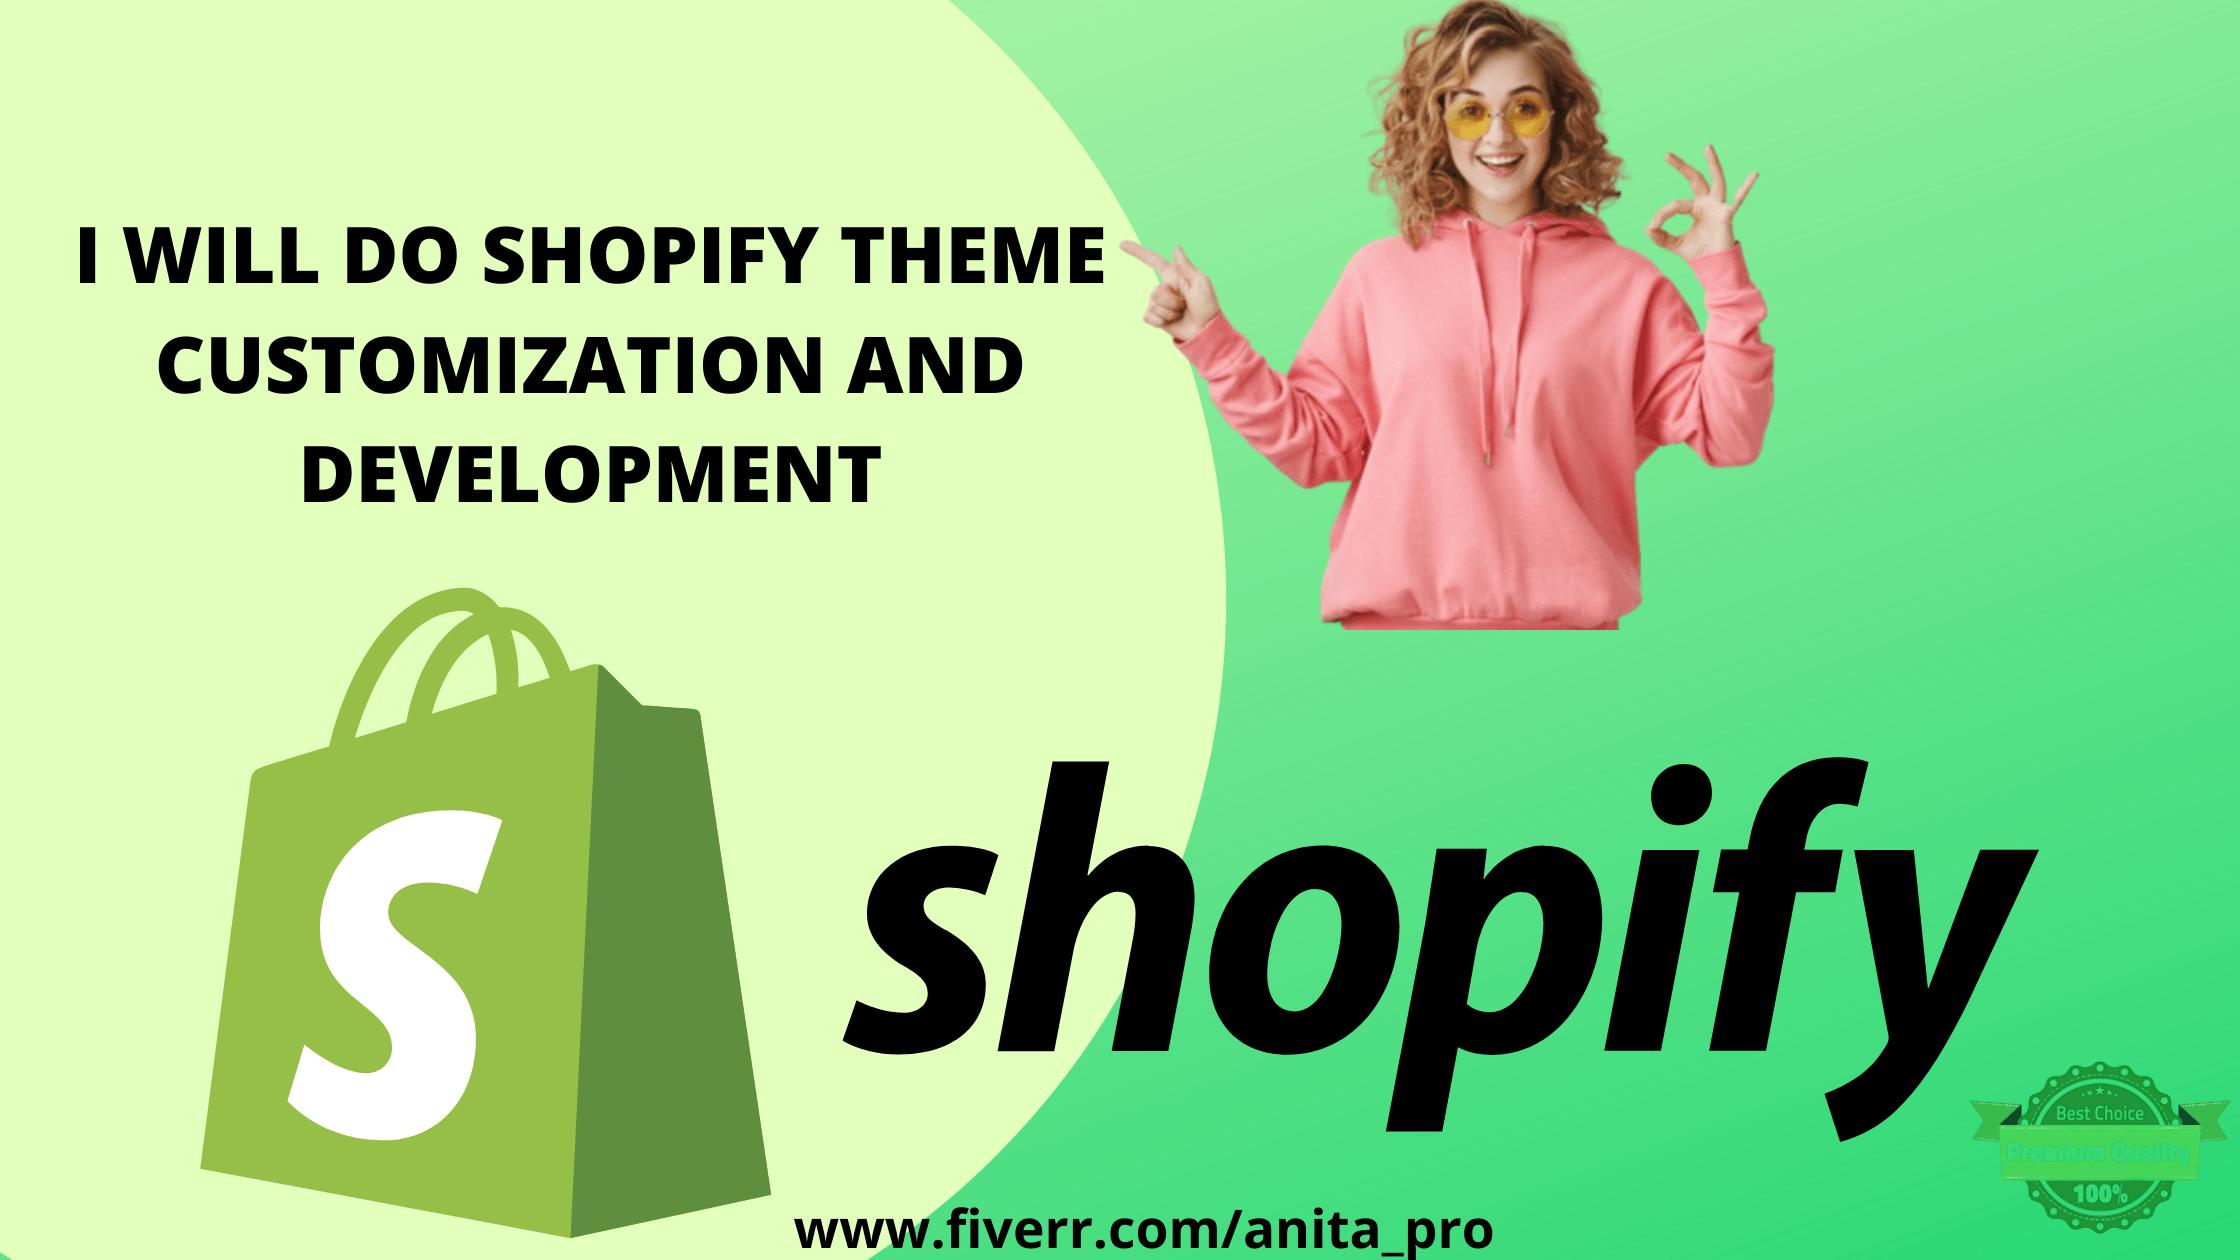 I will do shopify theme customization and development, FiverrBox